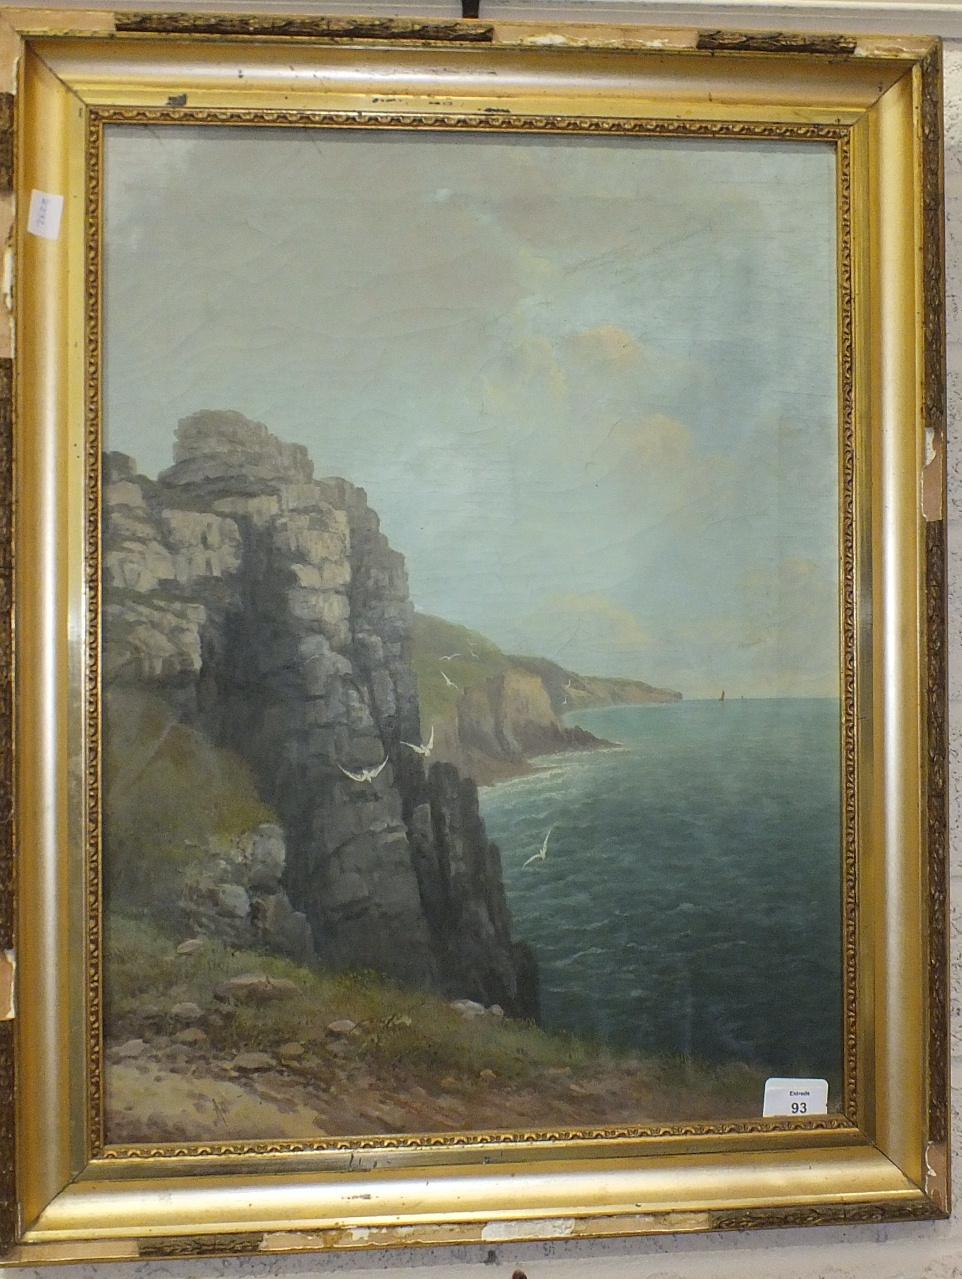 Lot 93 - Albert Scheth, 'Kynance Cove, Cornwall', indistinctly-signed oil on canvas, 25 x 44cm, Allam, '